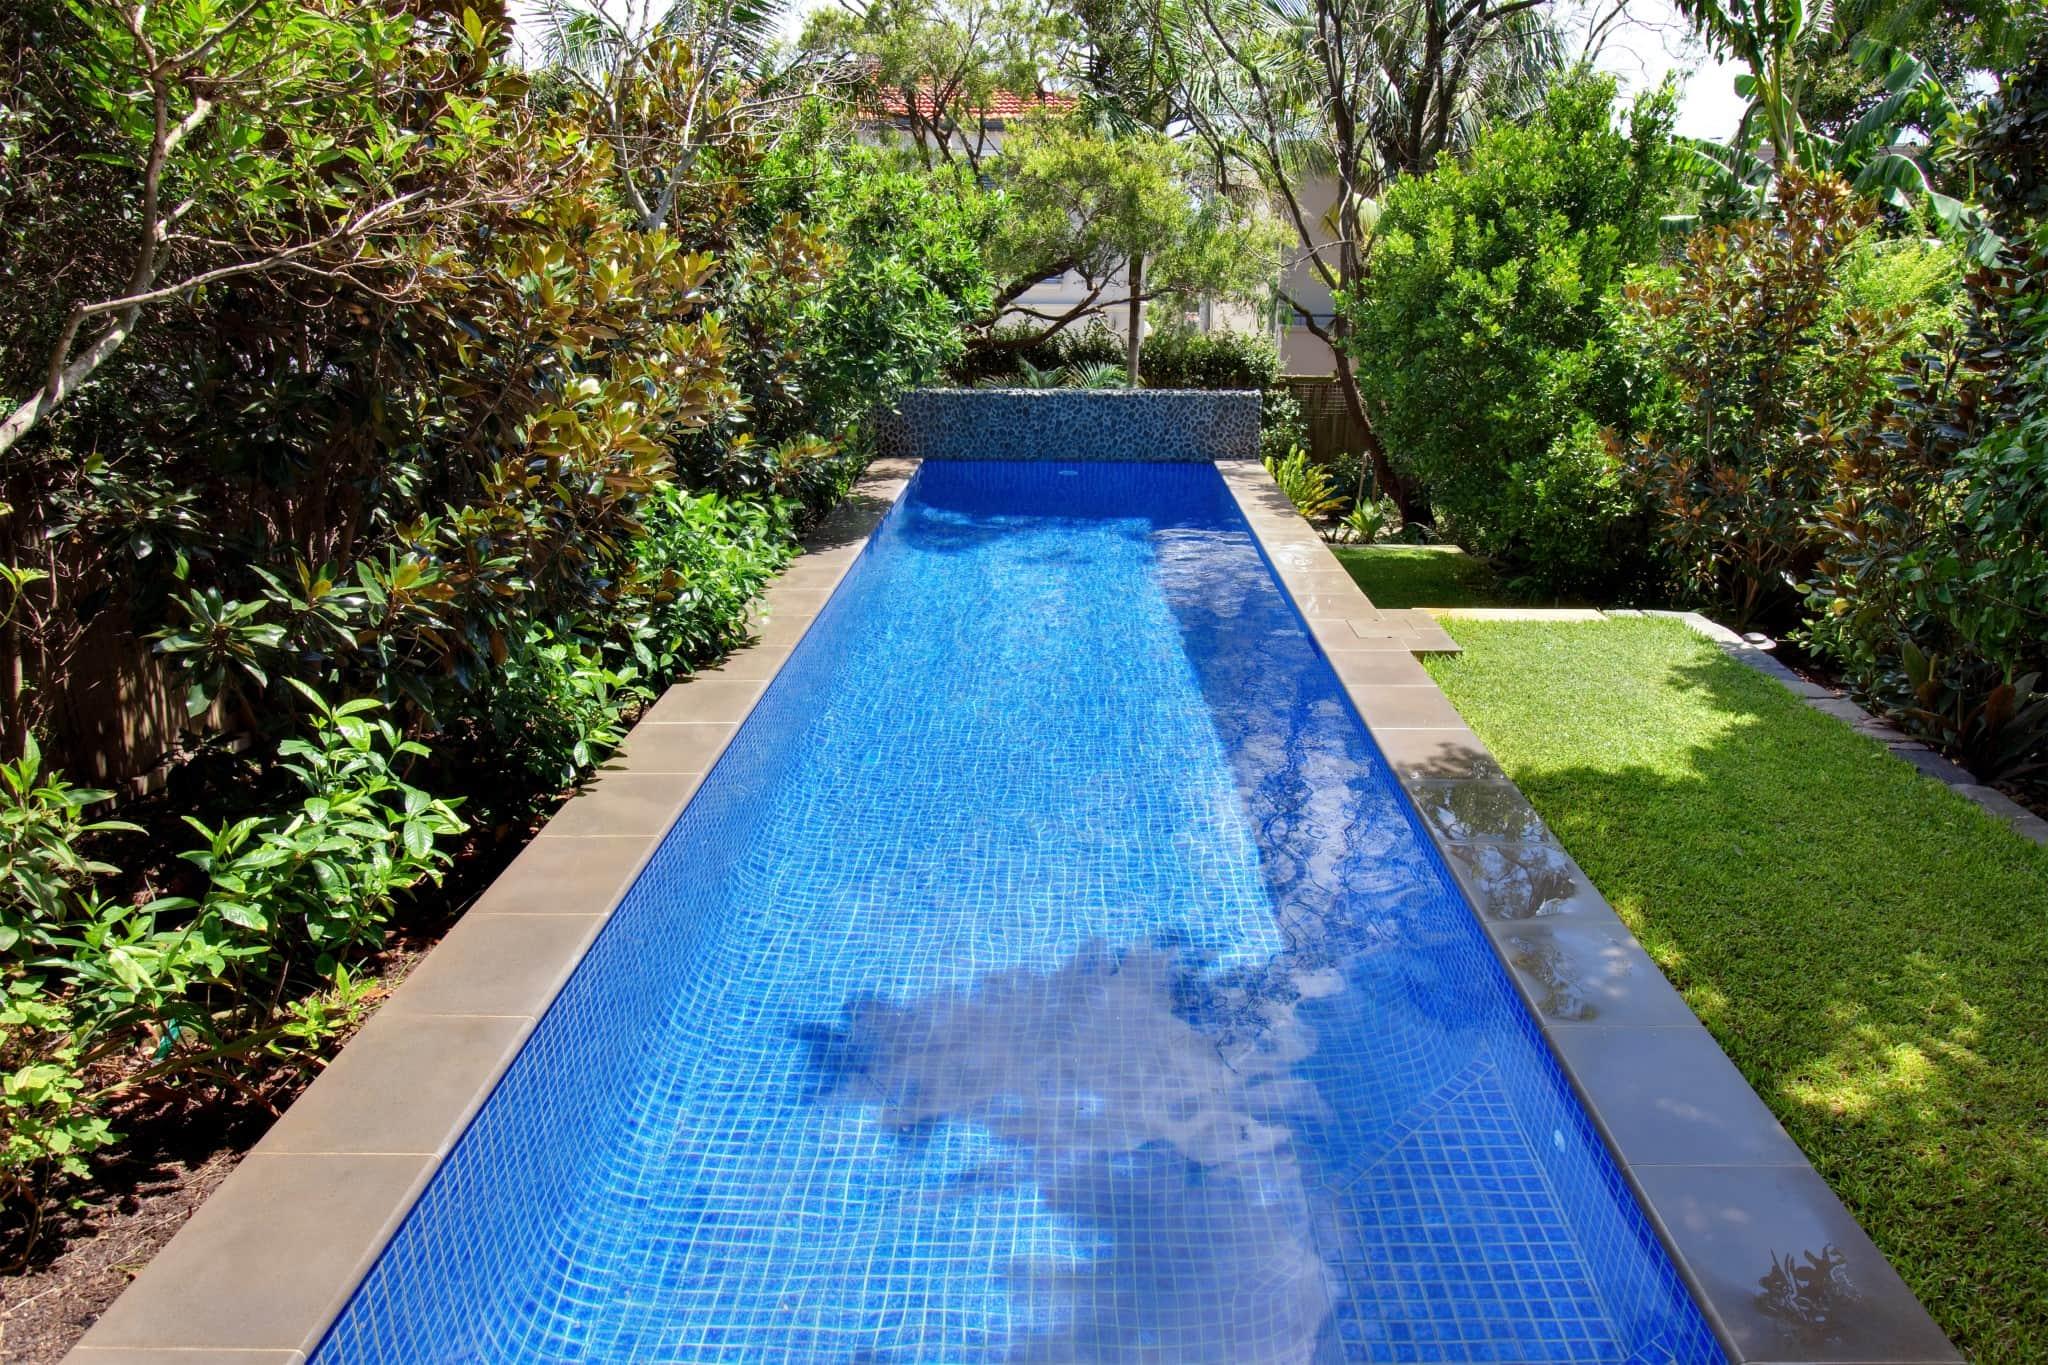 Fully Tiled Glass Mosaic Lap Pool in Mosman